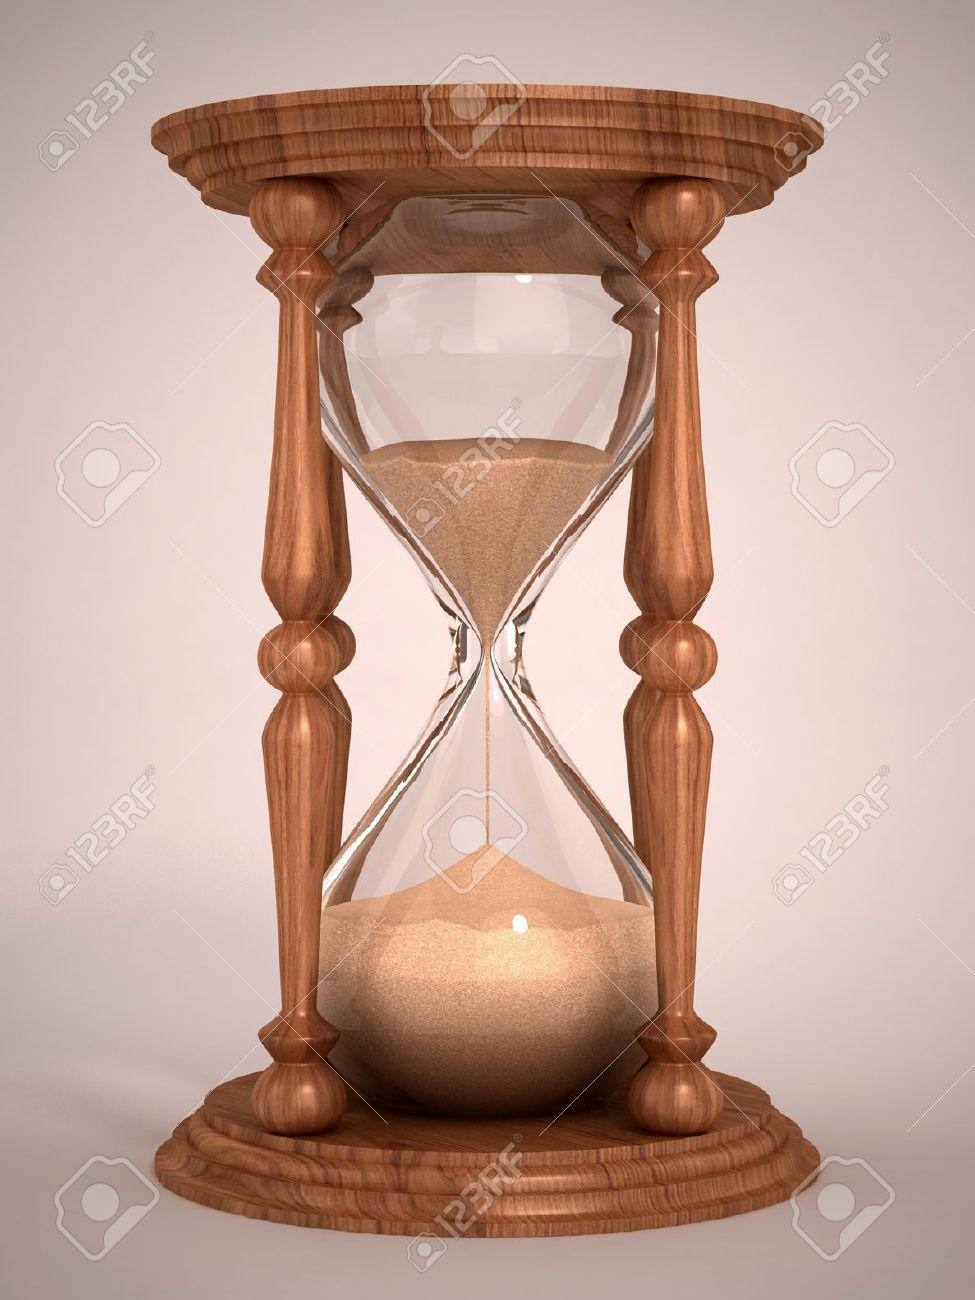 hourglass sandglass sand timer sand clock 3d illustration stock